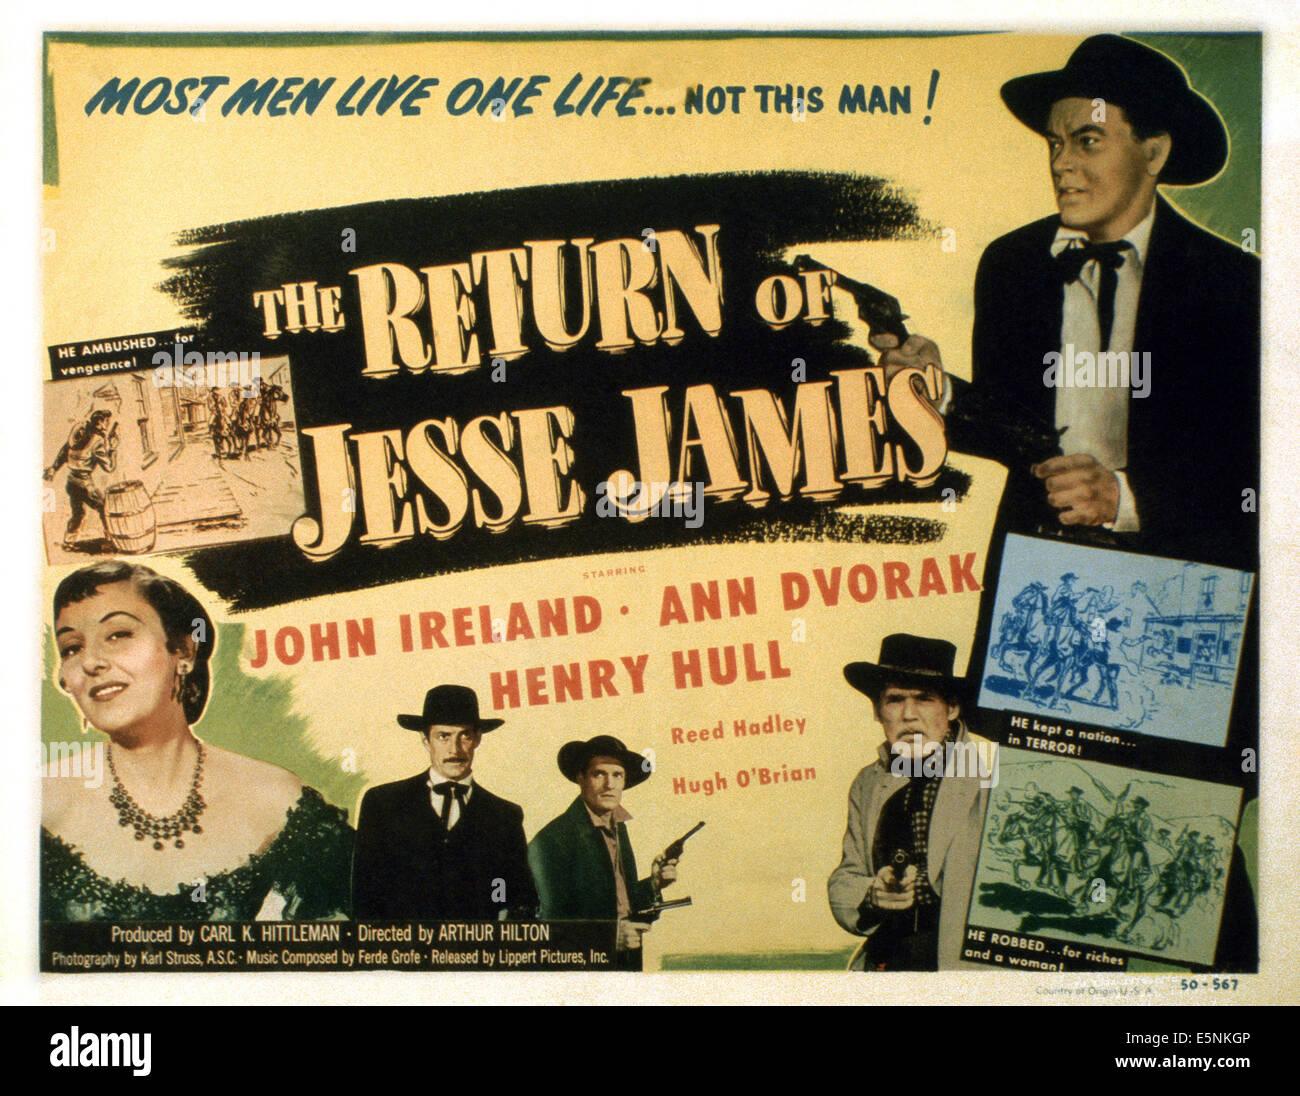 THE RETURN OF JESSE JAMES, US lobbycard, John Ireland (top right), Henry Hull (bottom right), Ann Dvorak (bottom - Stock Image